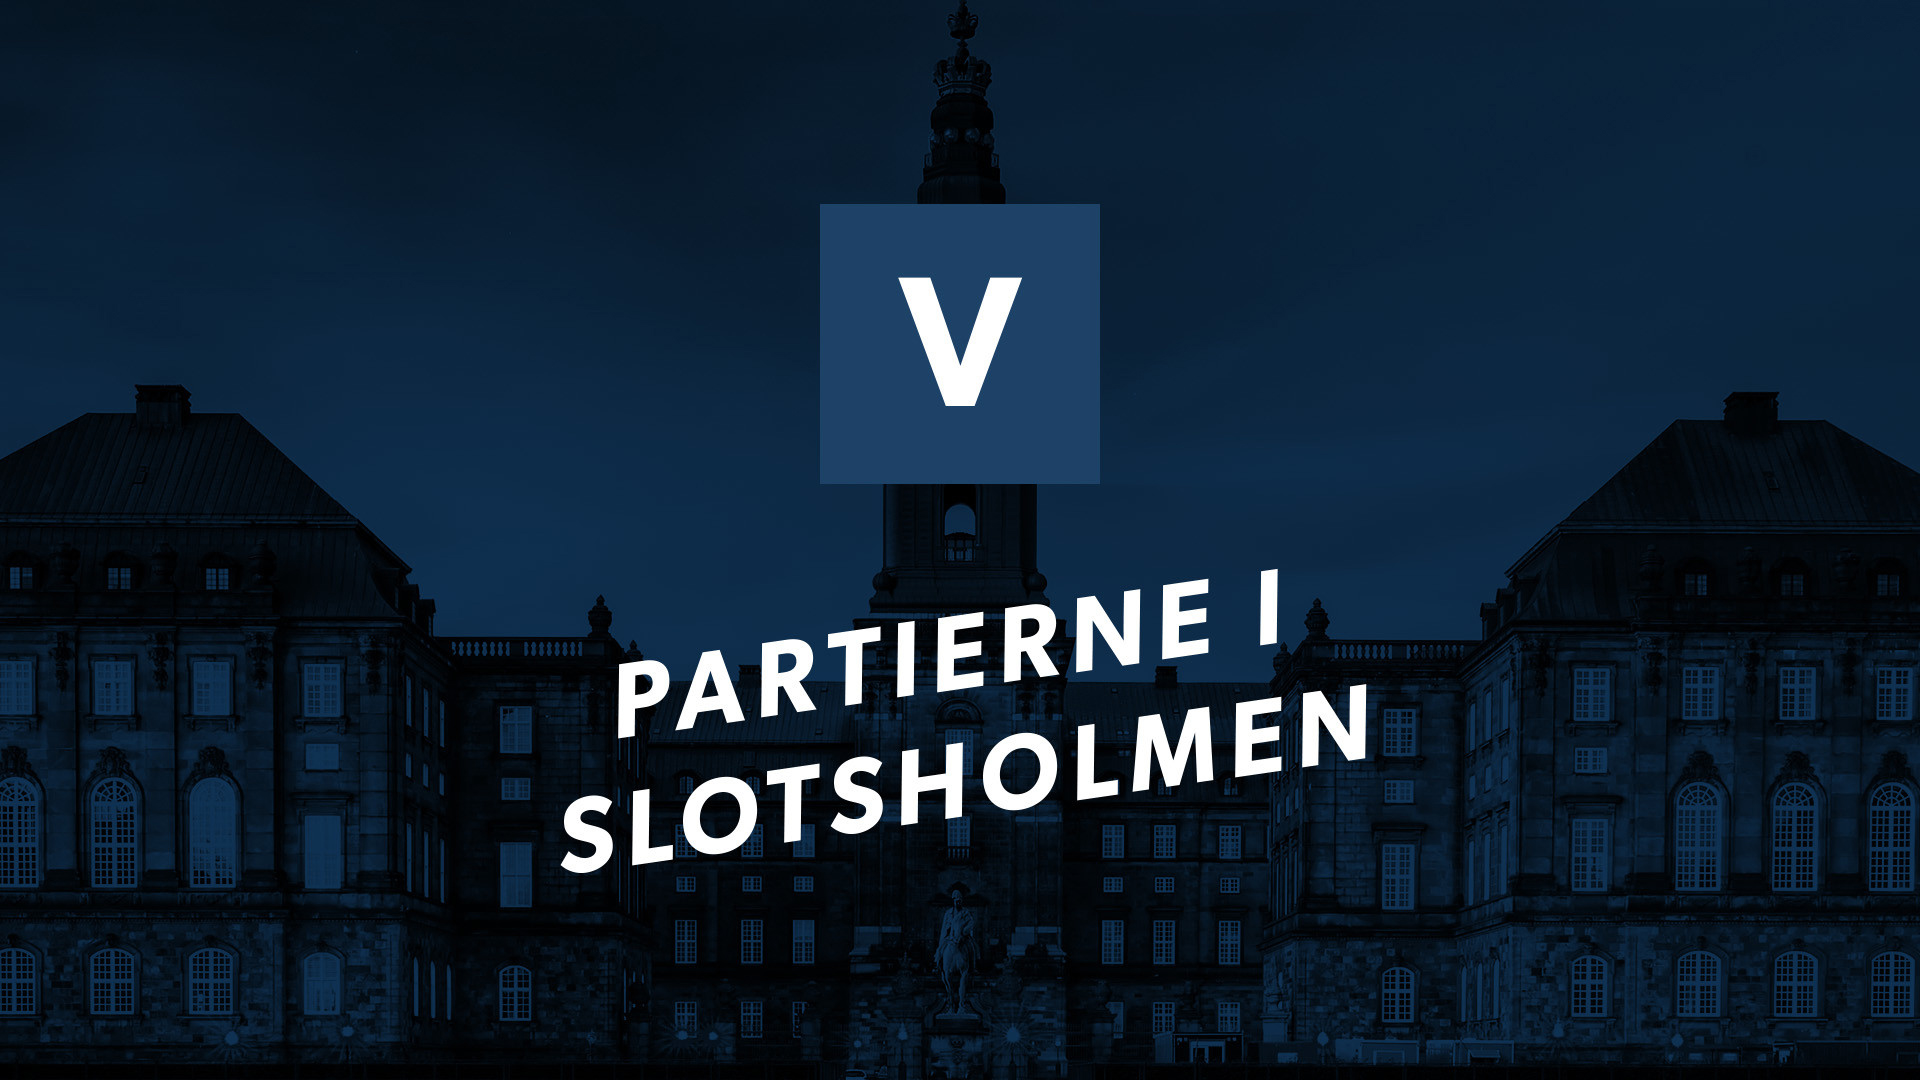 slotsholmen-venstre.jpg